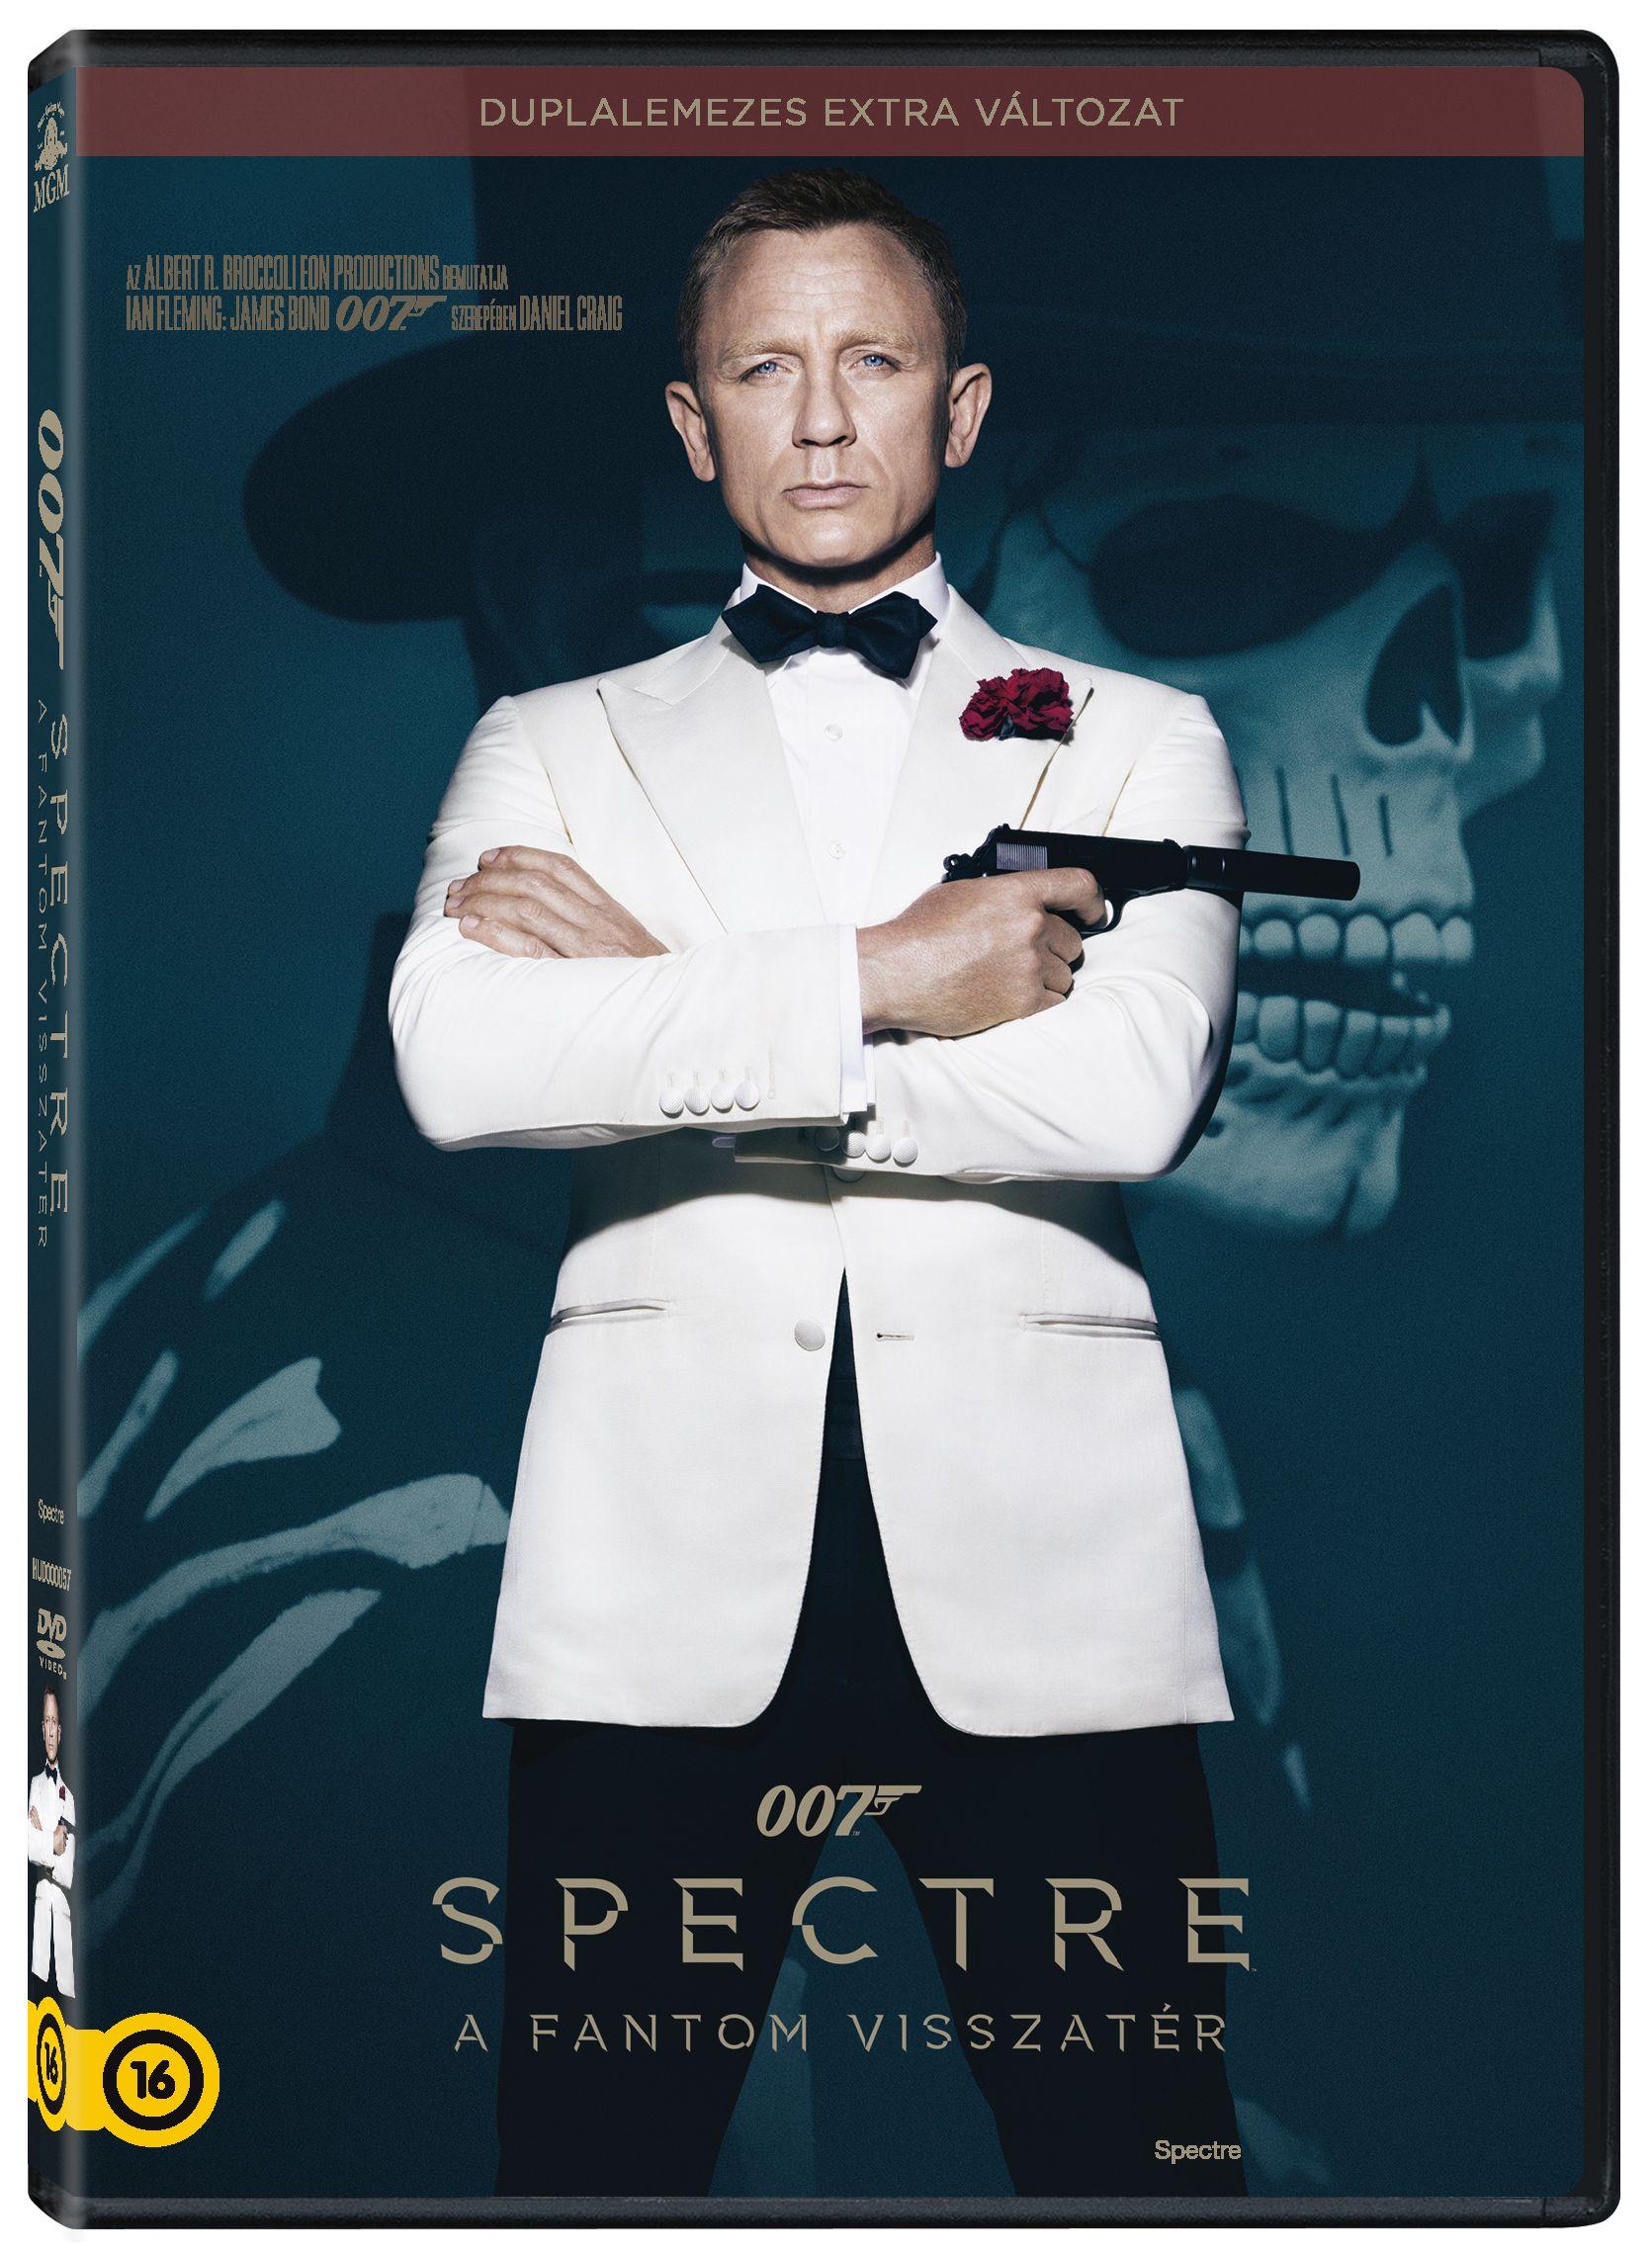 007 Spectre - A Fantom visszatér DVD